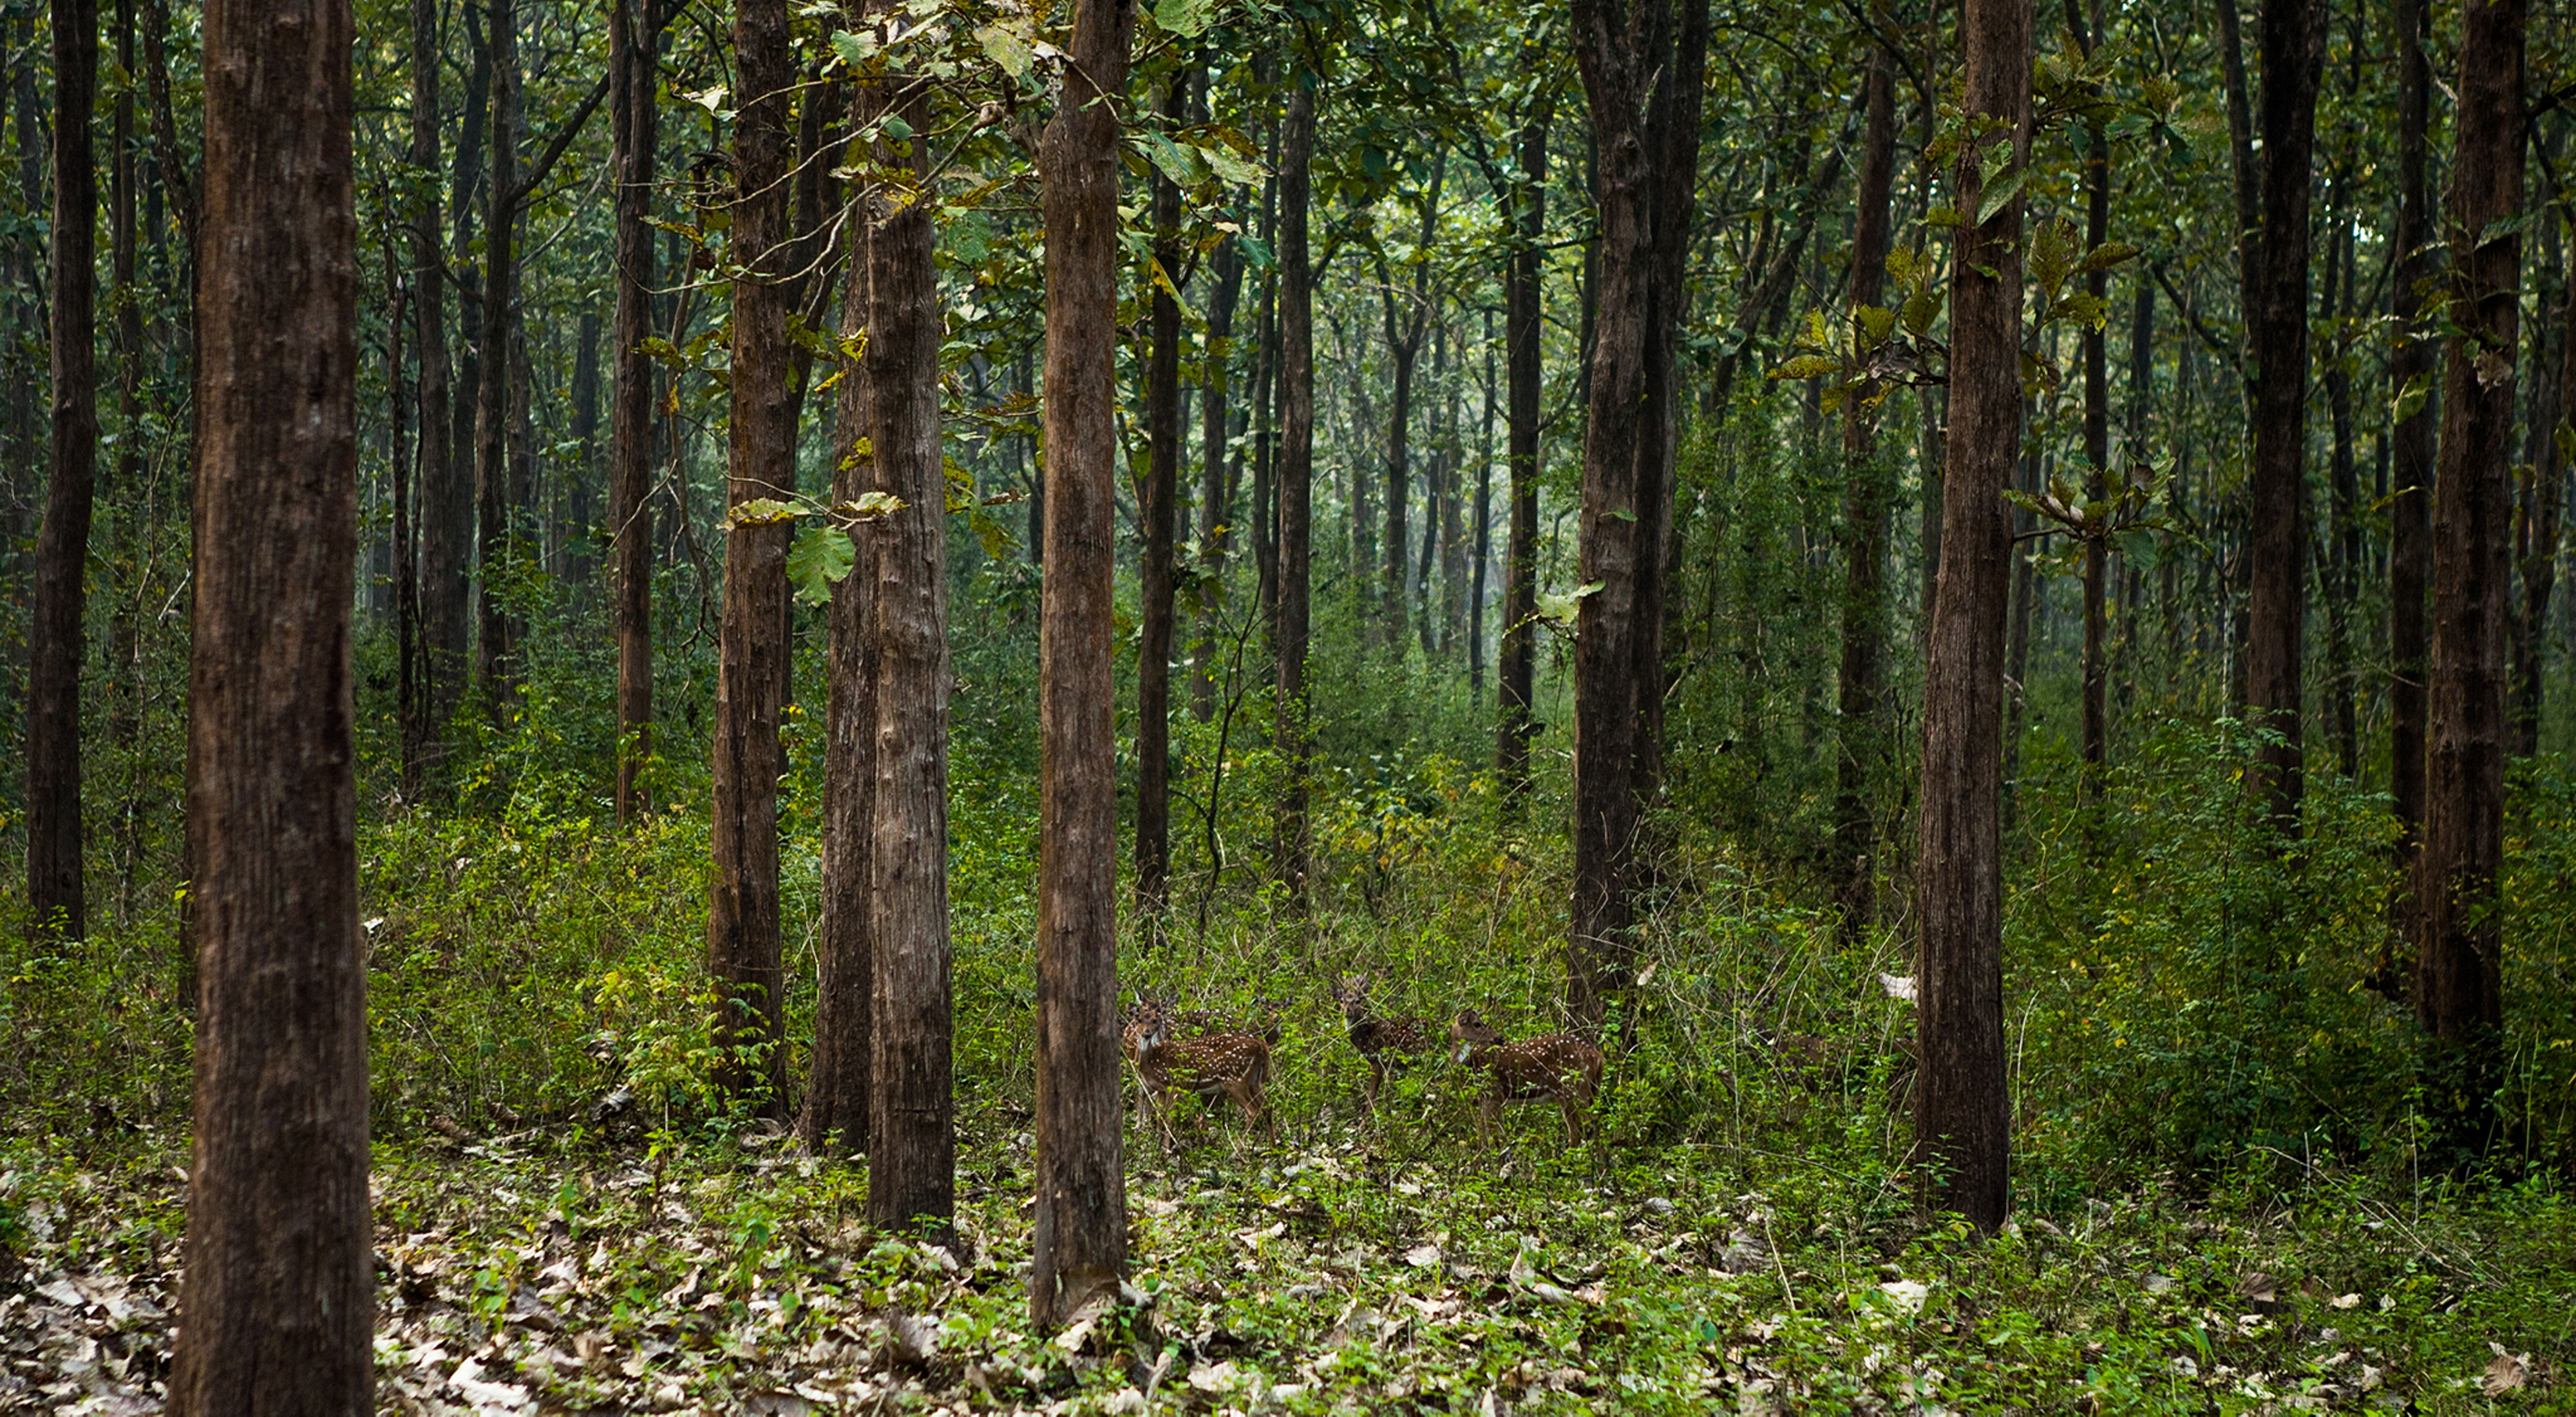 Nagarhole National Park, Coorg, India